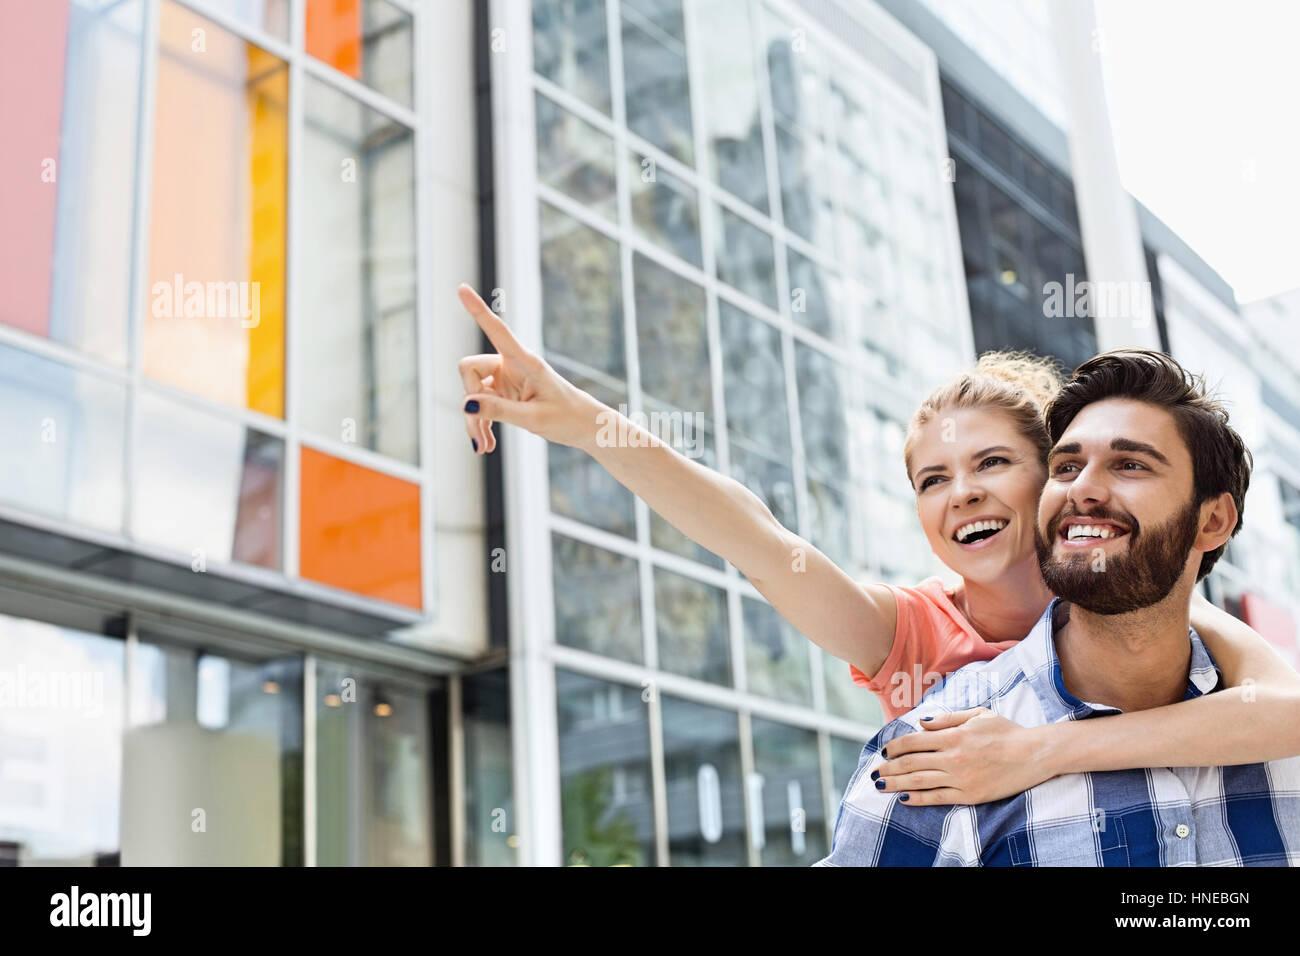 Cheerful woman showing something to man while enjoying piggyback ride in city Stock Photo